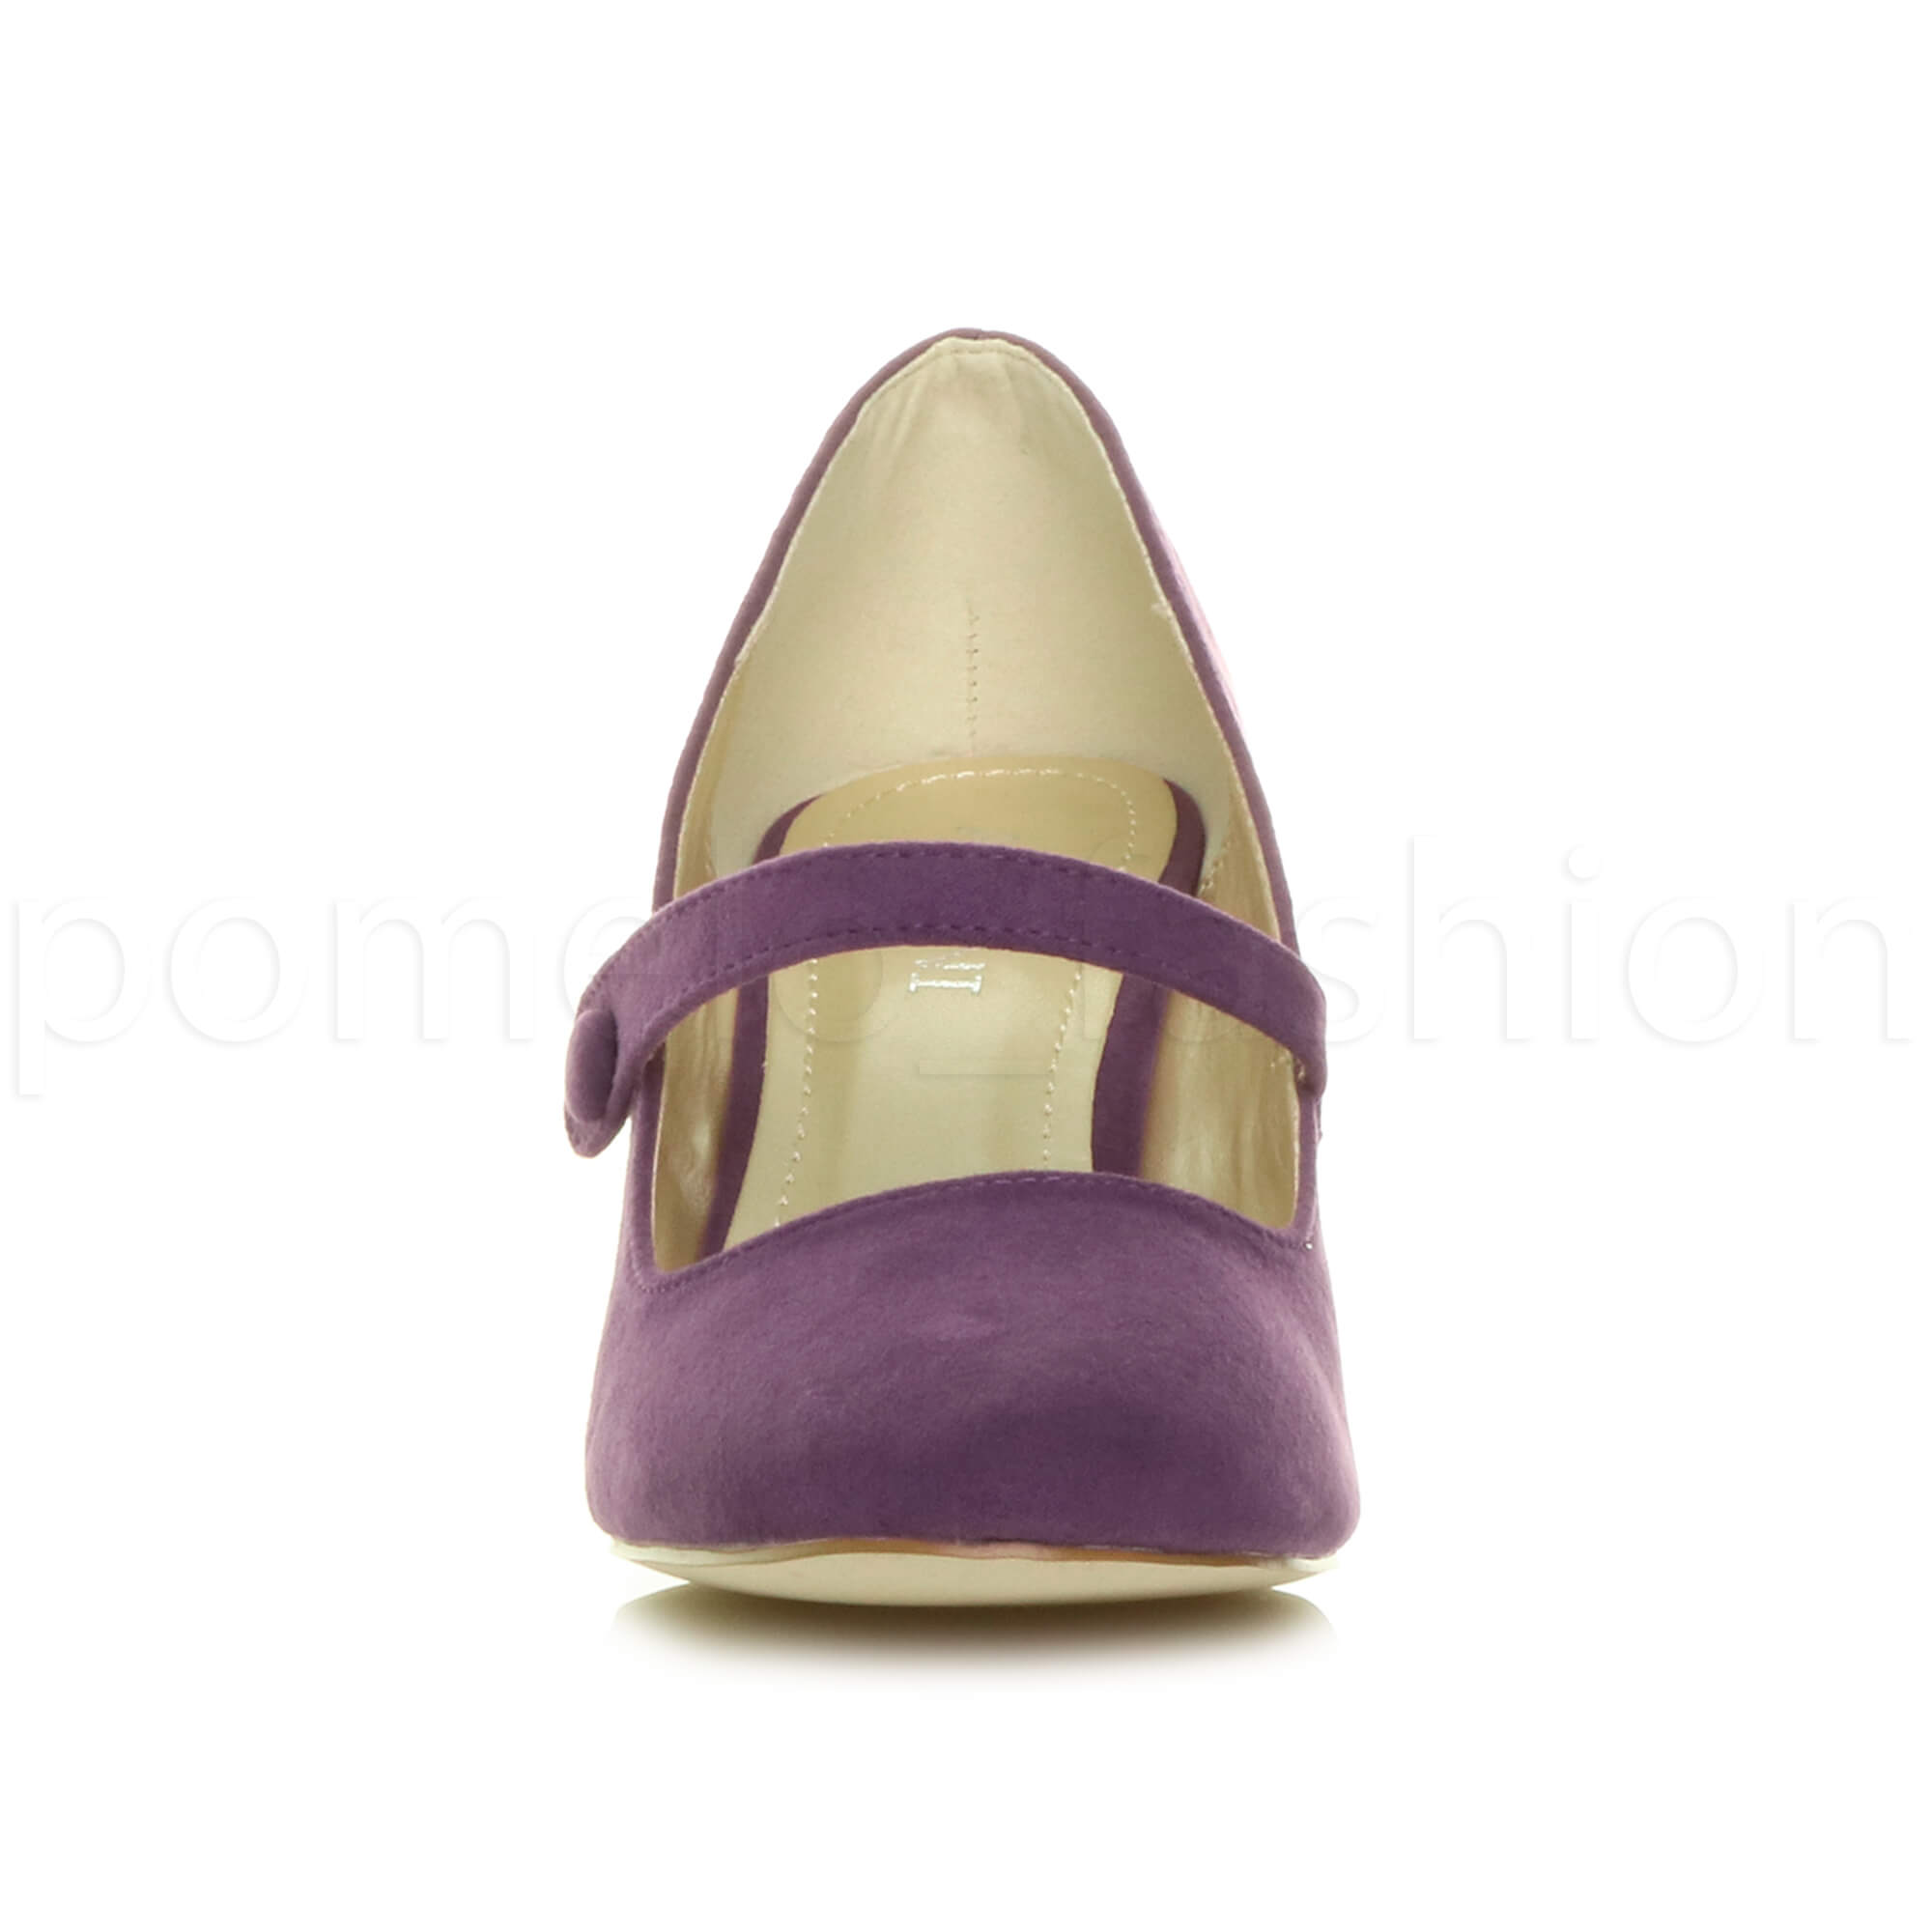 miniatura 132 - Donna basso tacco medio Mary Jane Damigella Matrimonio Pompe Scarpe Da Sera Taglia